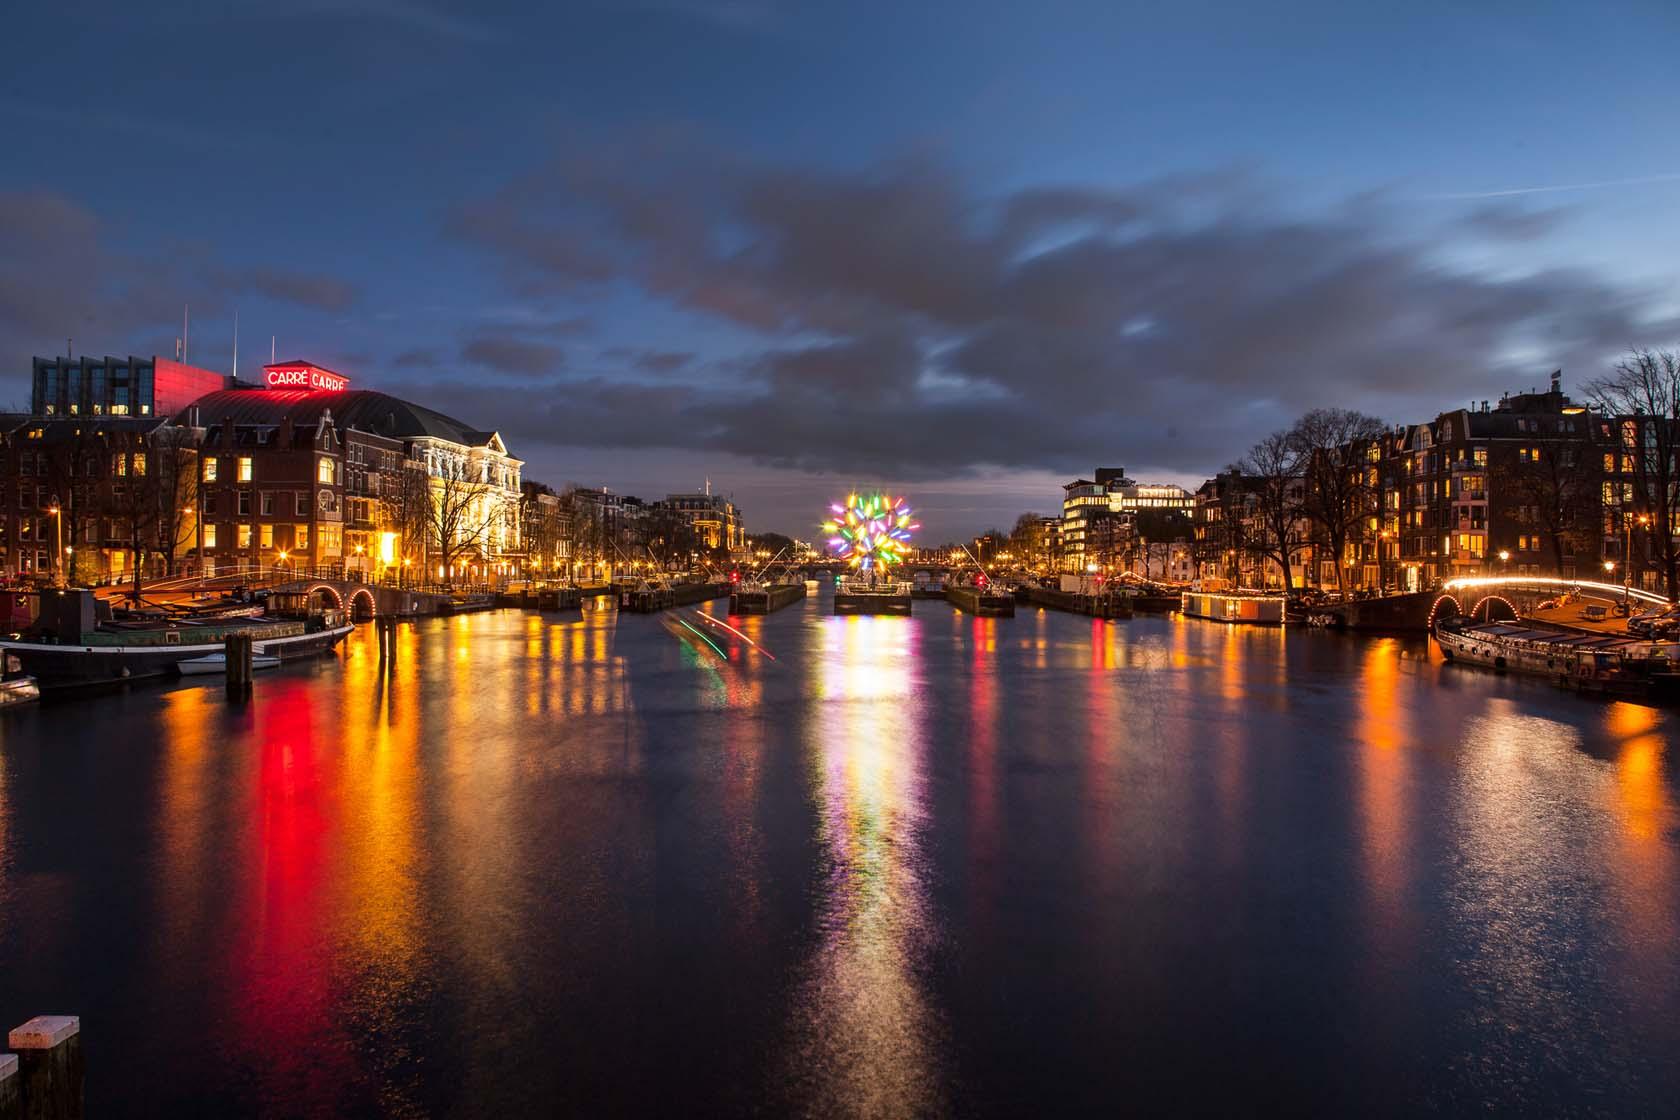 Amsterdam-Light-Festival-Stichting-Amsterdam-Light-Festival-Amsterdam-2013-Janus-van-den-Eijnden-14